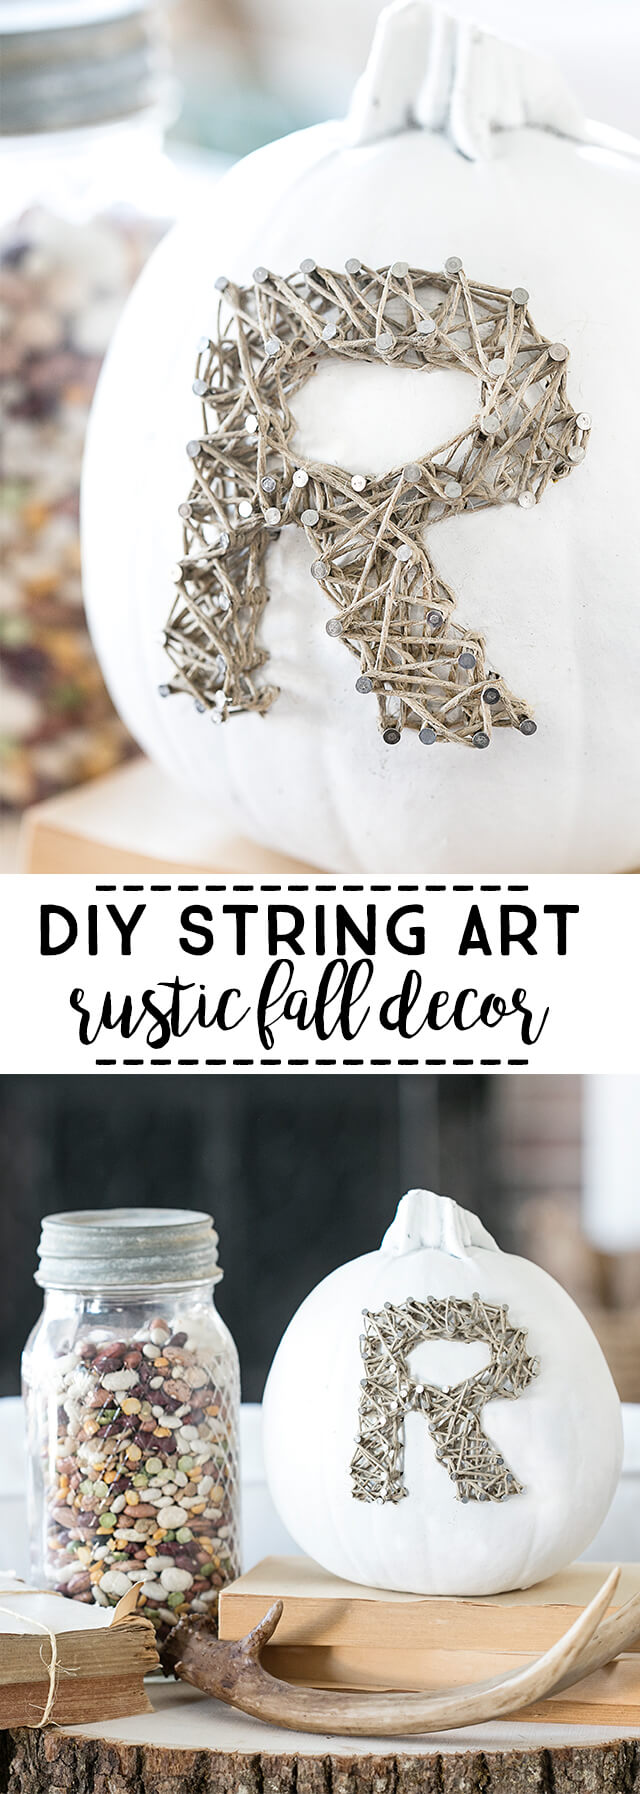 Rustic String Art Pumpkin Decoration